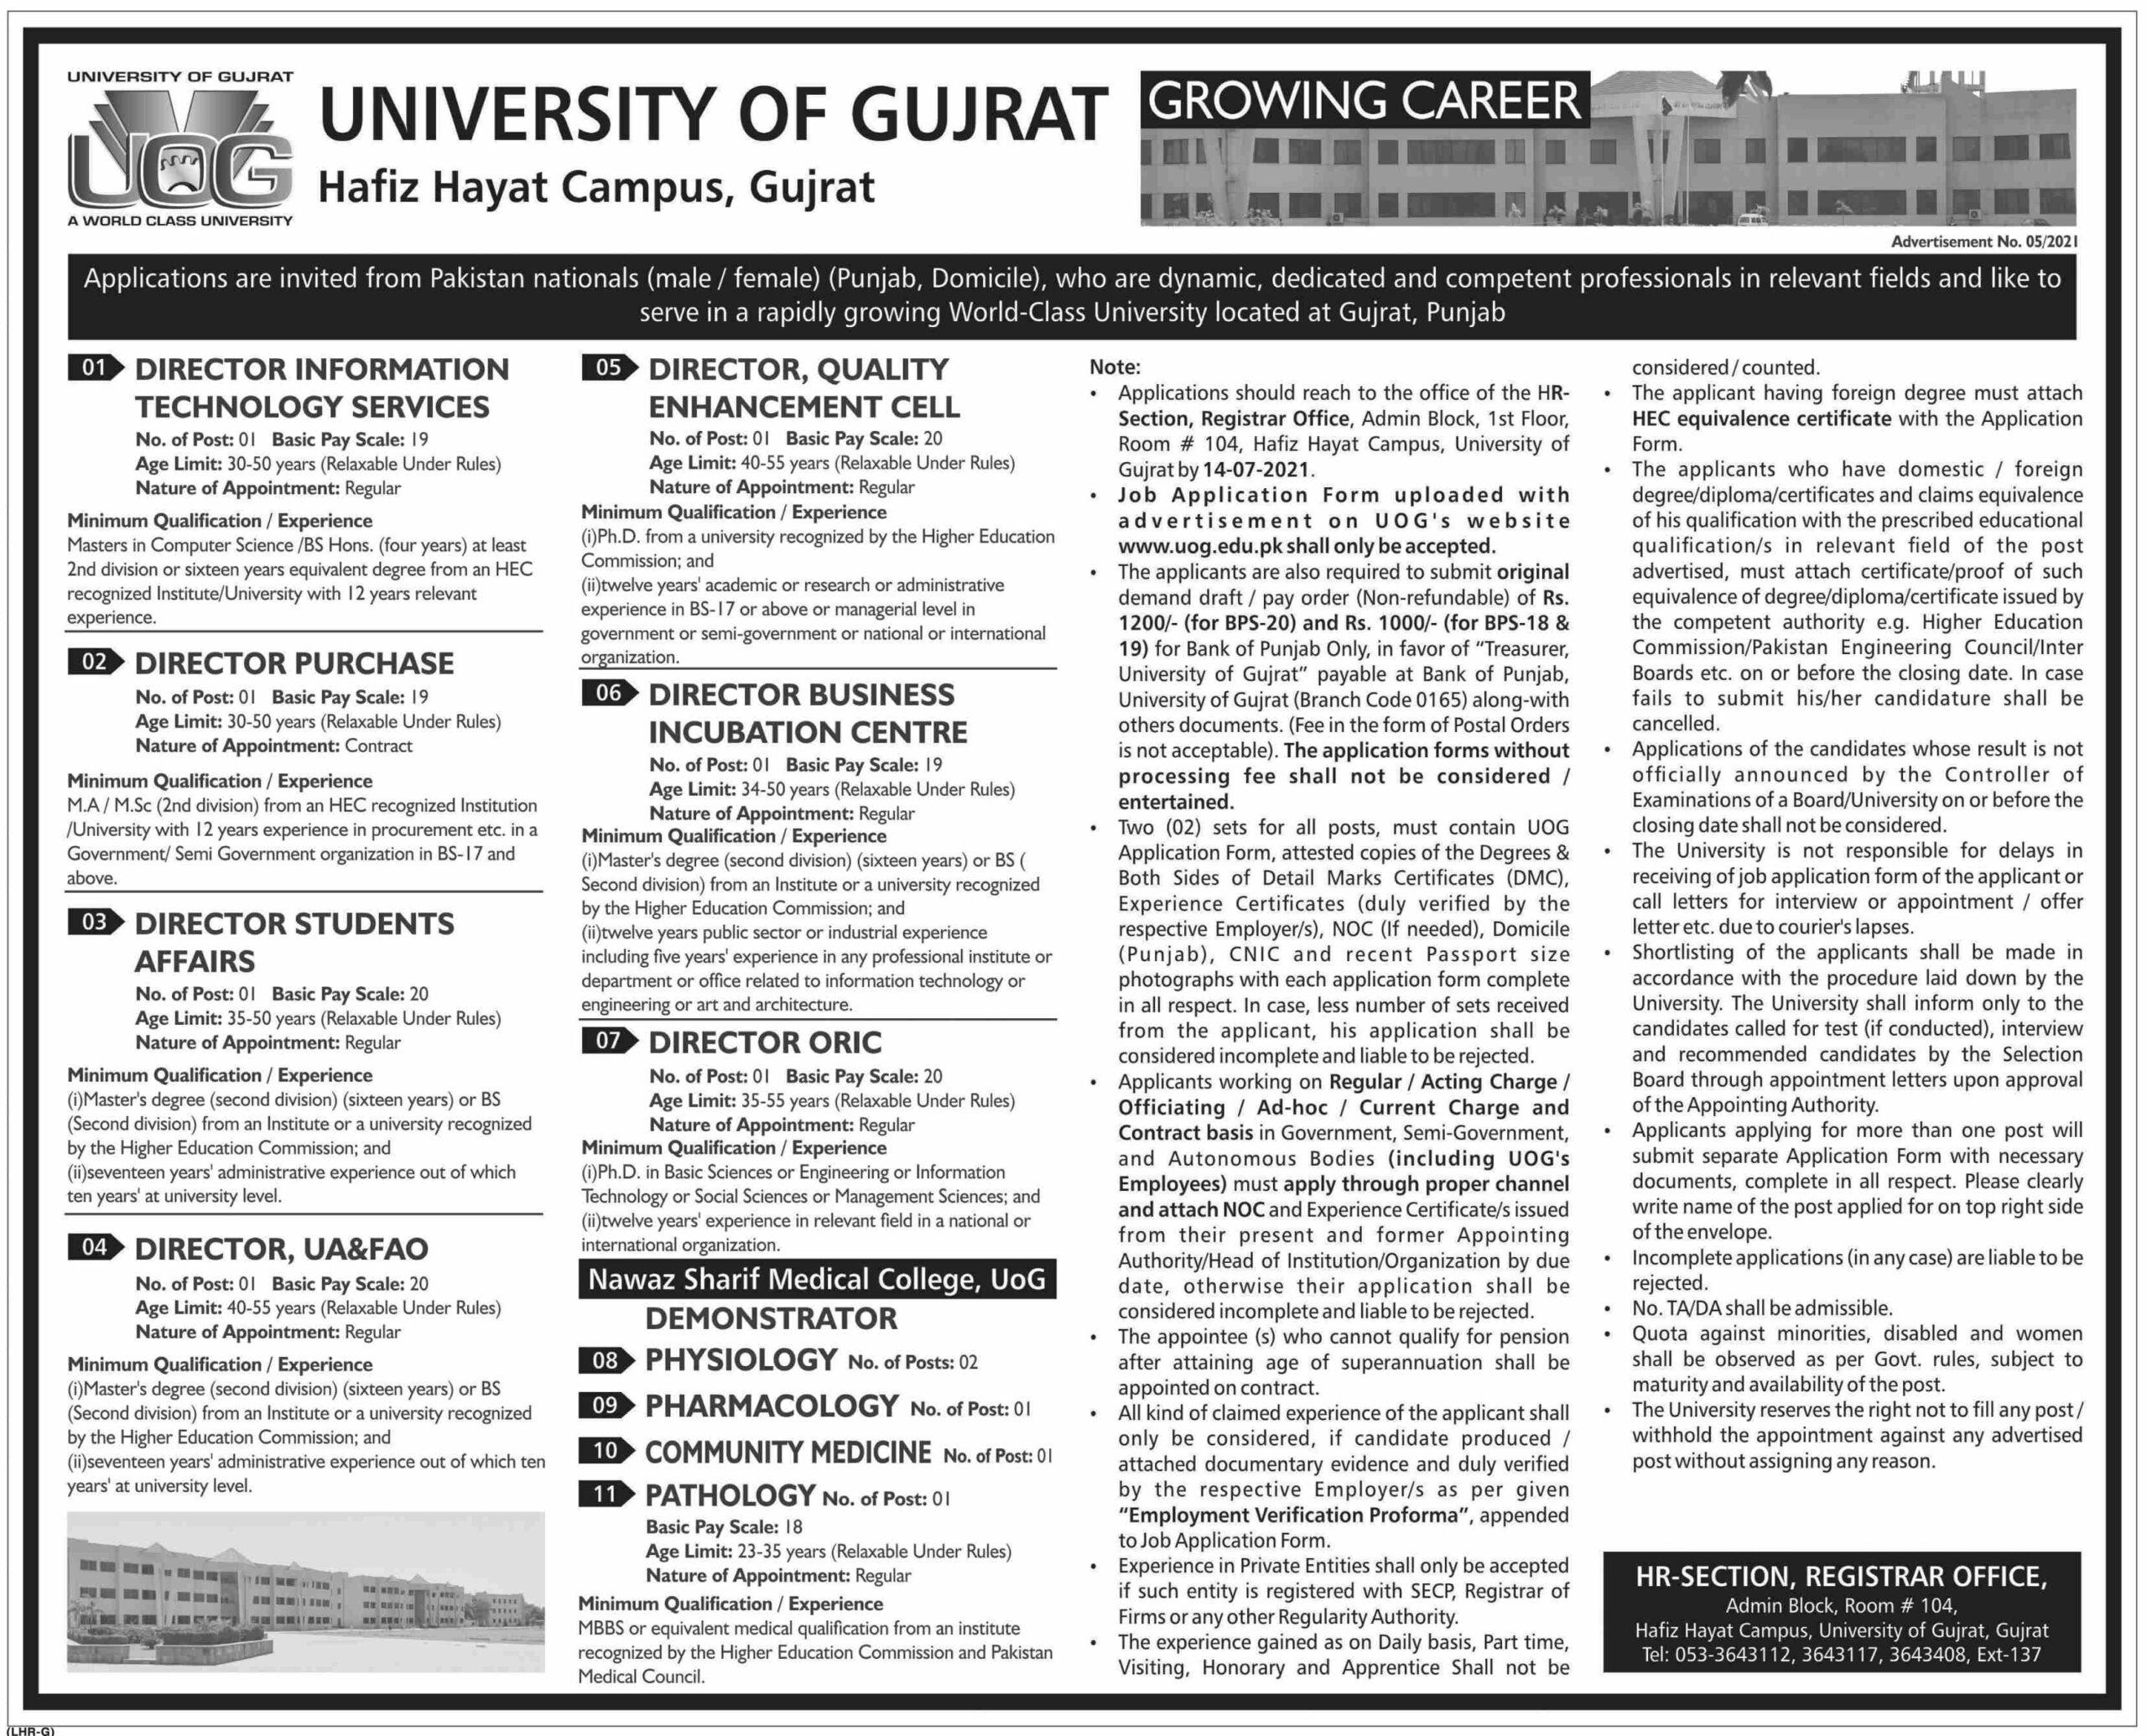 University of Gujrat UOG Jobs June 2021 for Director